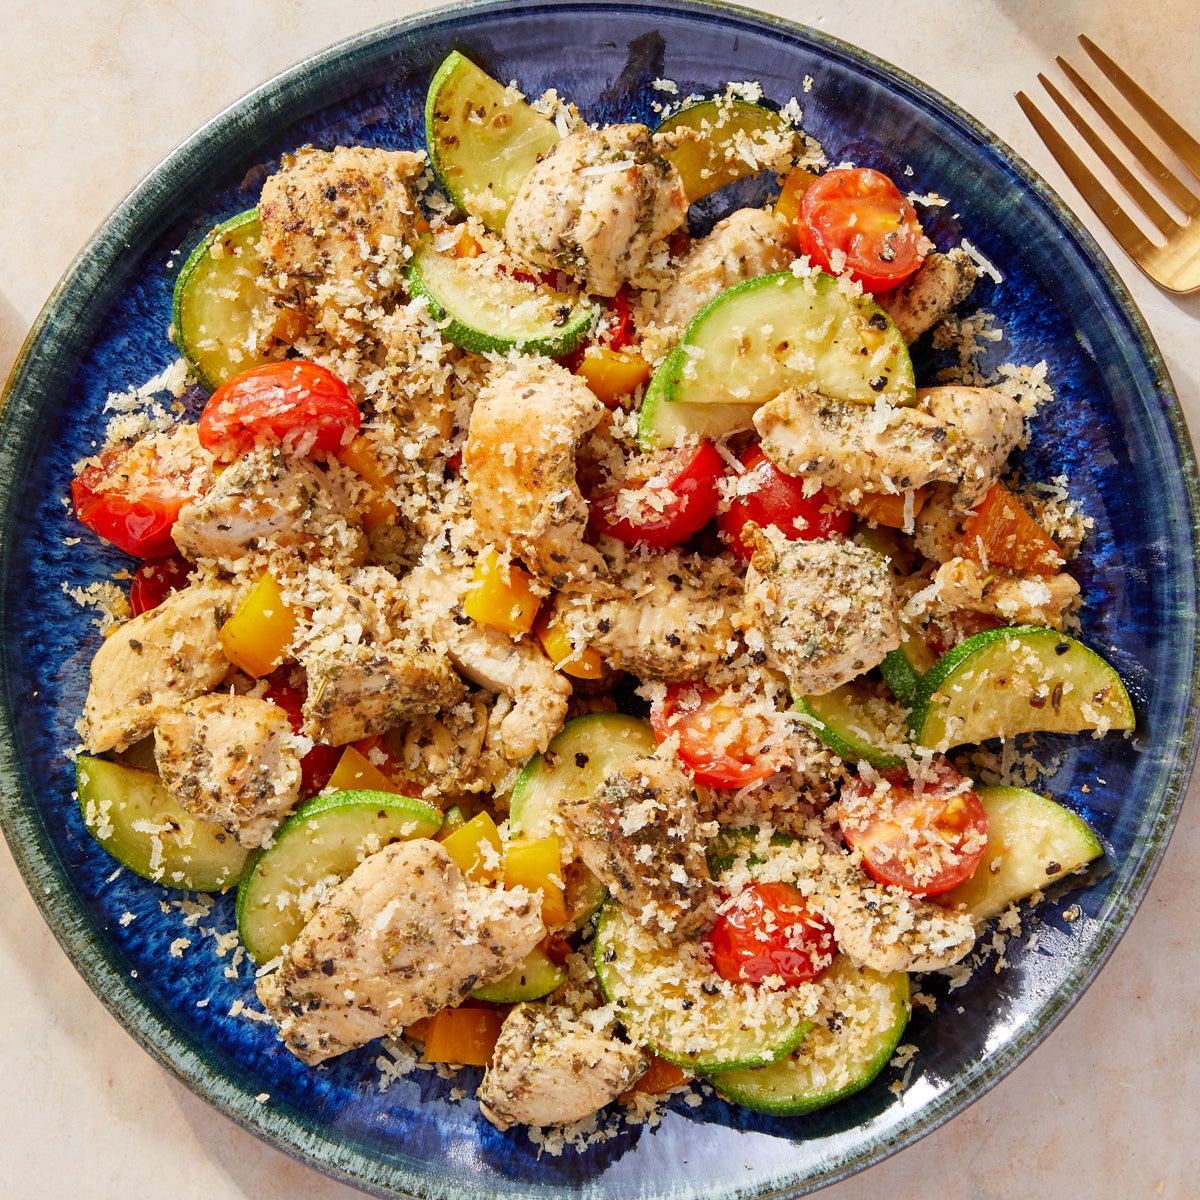 Italian Chicken & Vegetable Sauté with Grana Padano Breadcrumbs